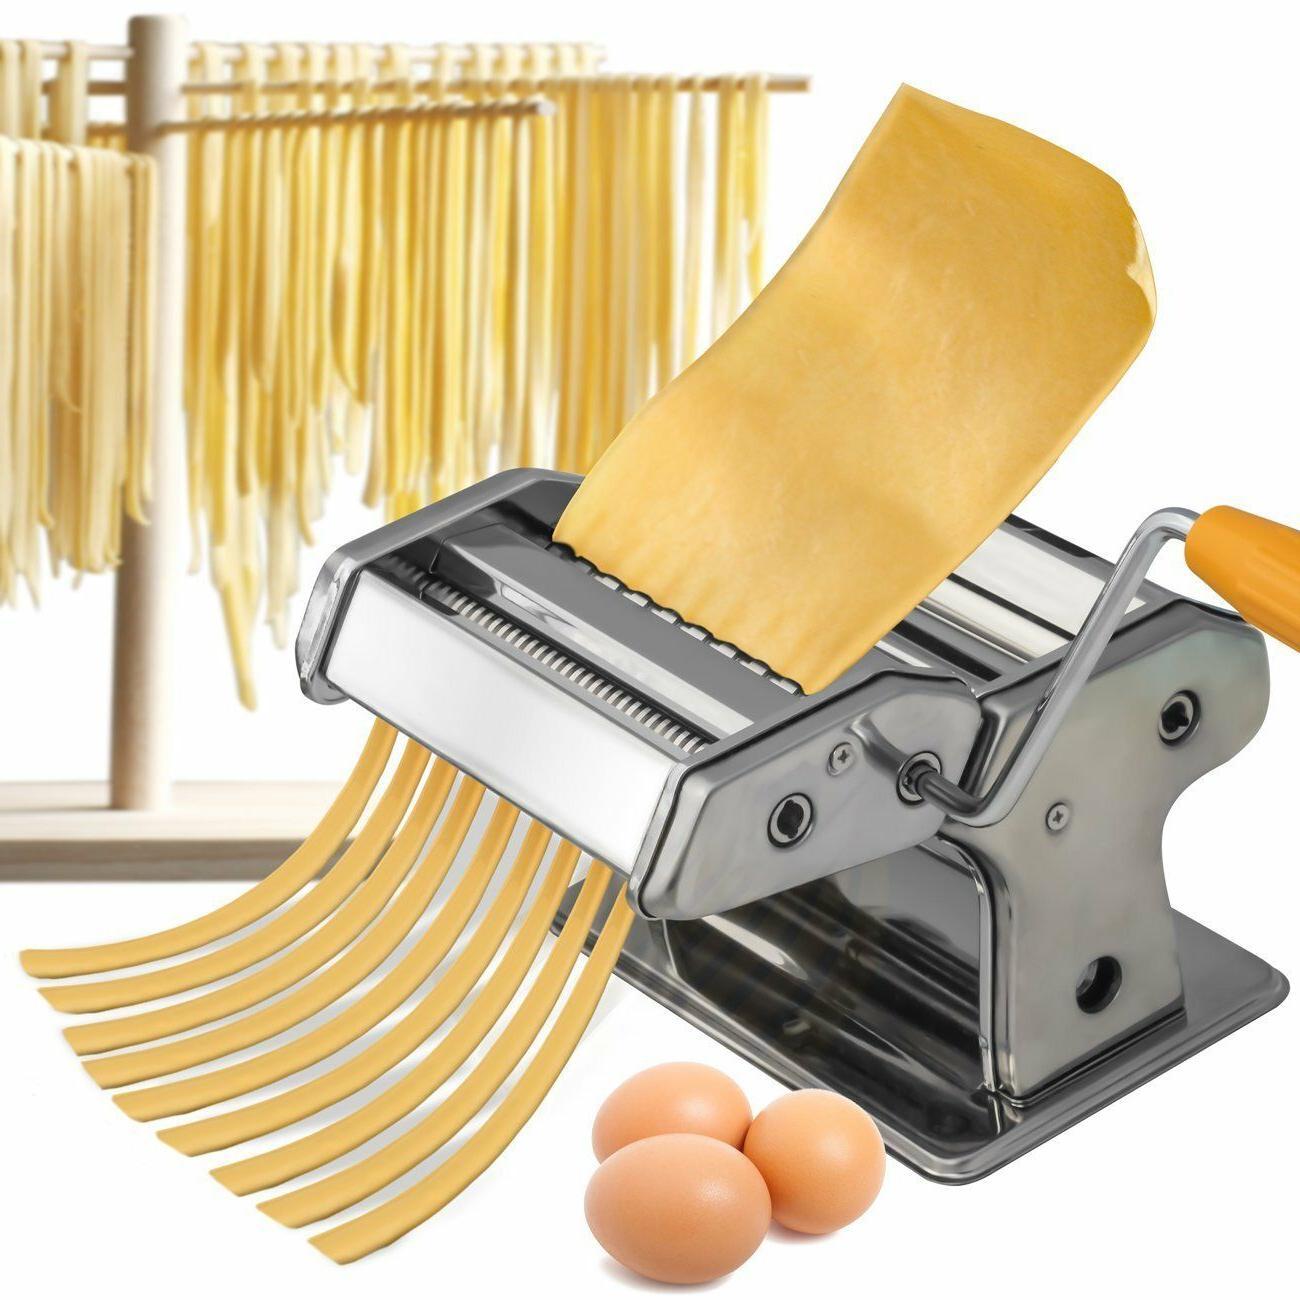 pasta maker spaghetti fettuccine noodle hand cutter